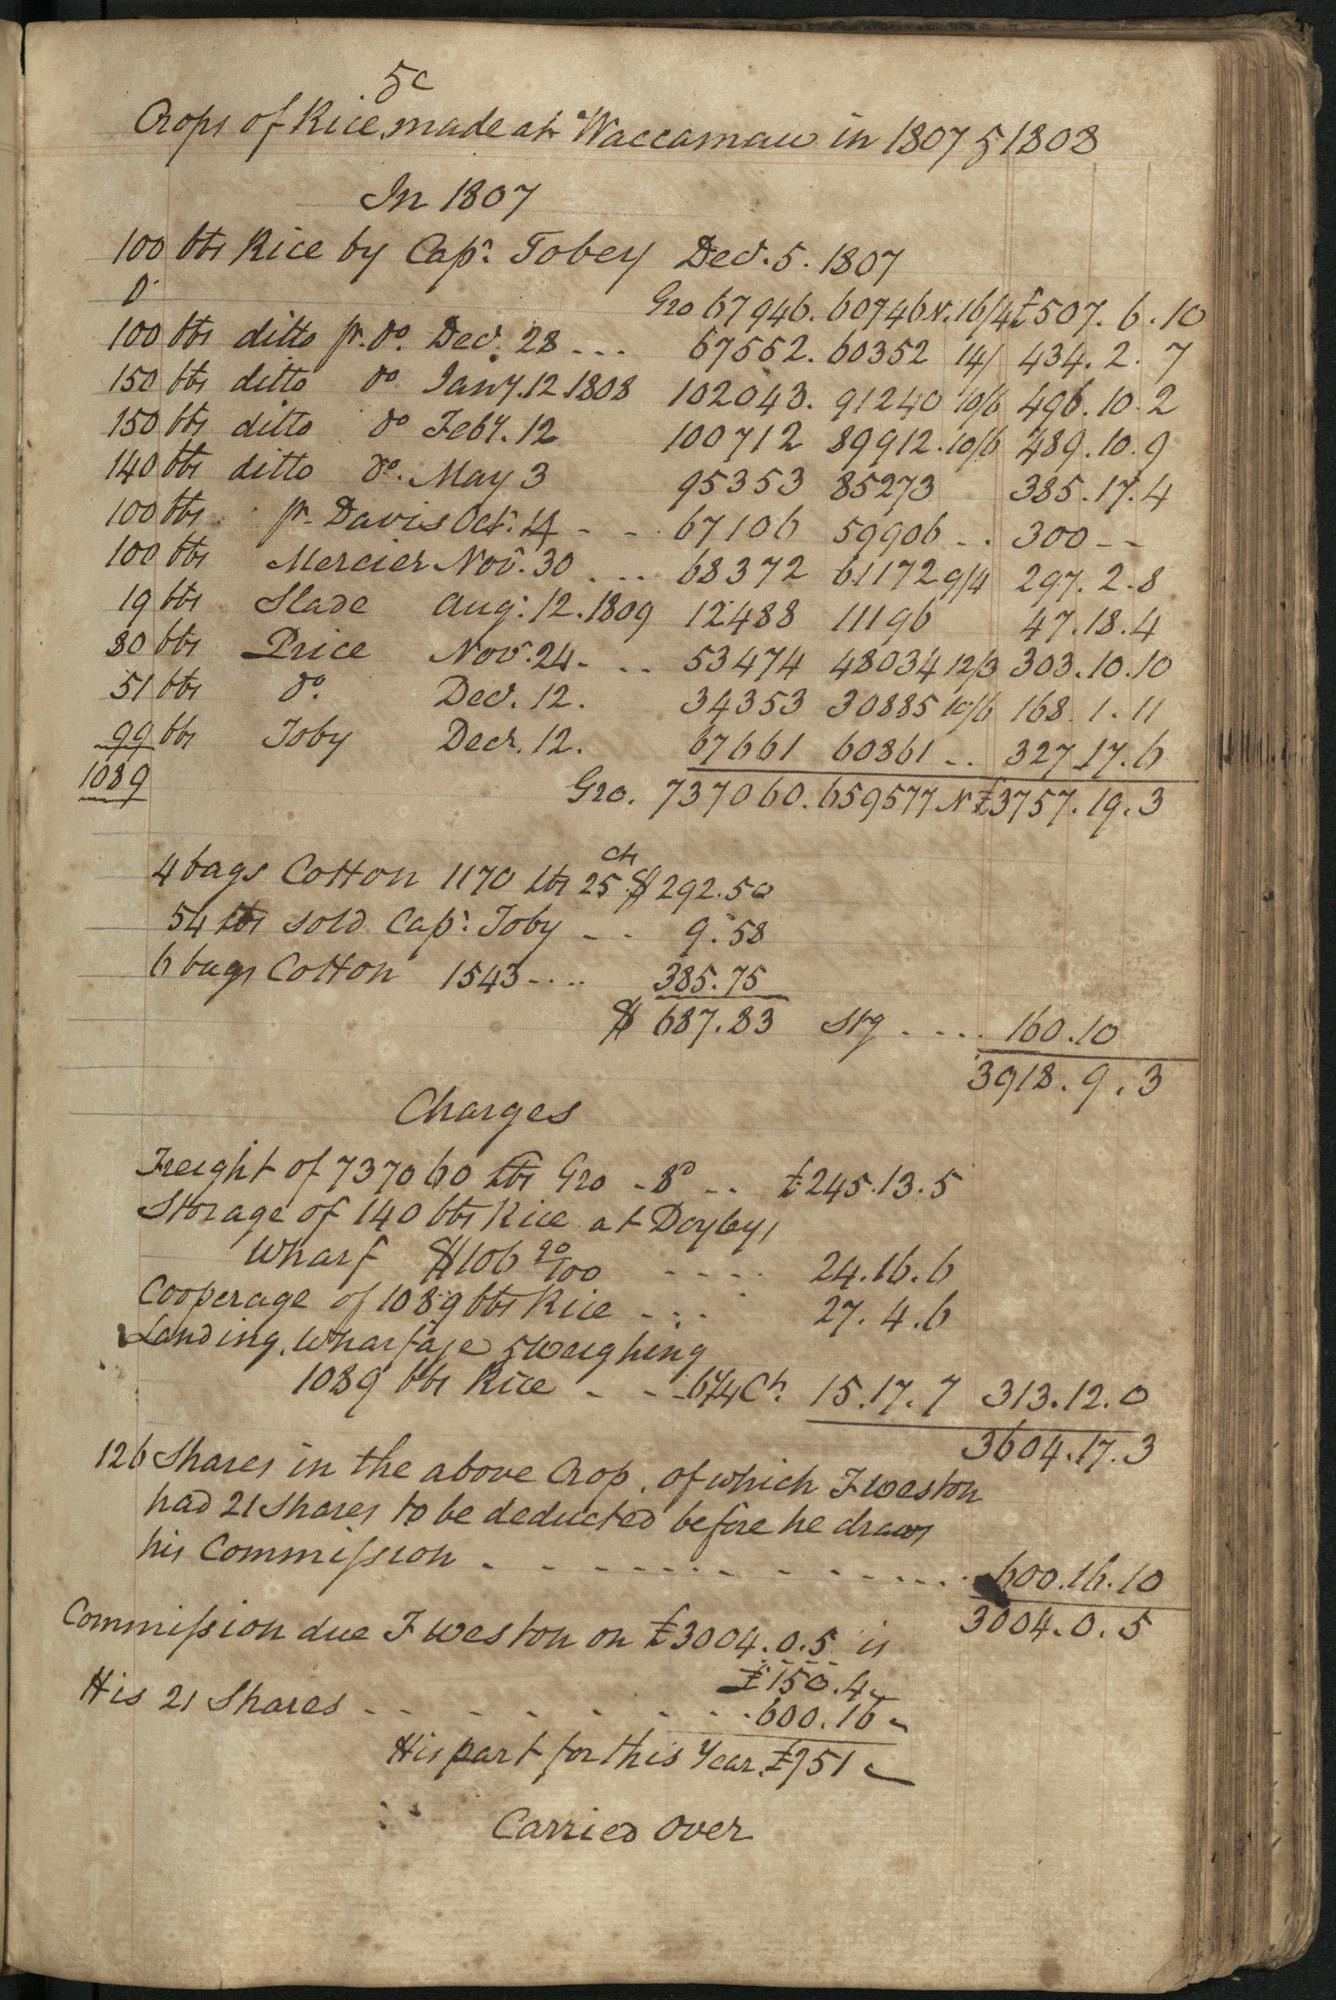 Plowden Weston's Plantation Journal, page 101